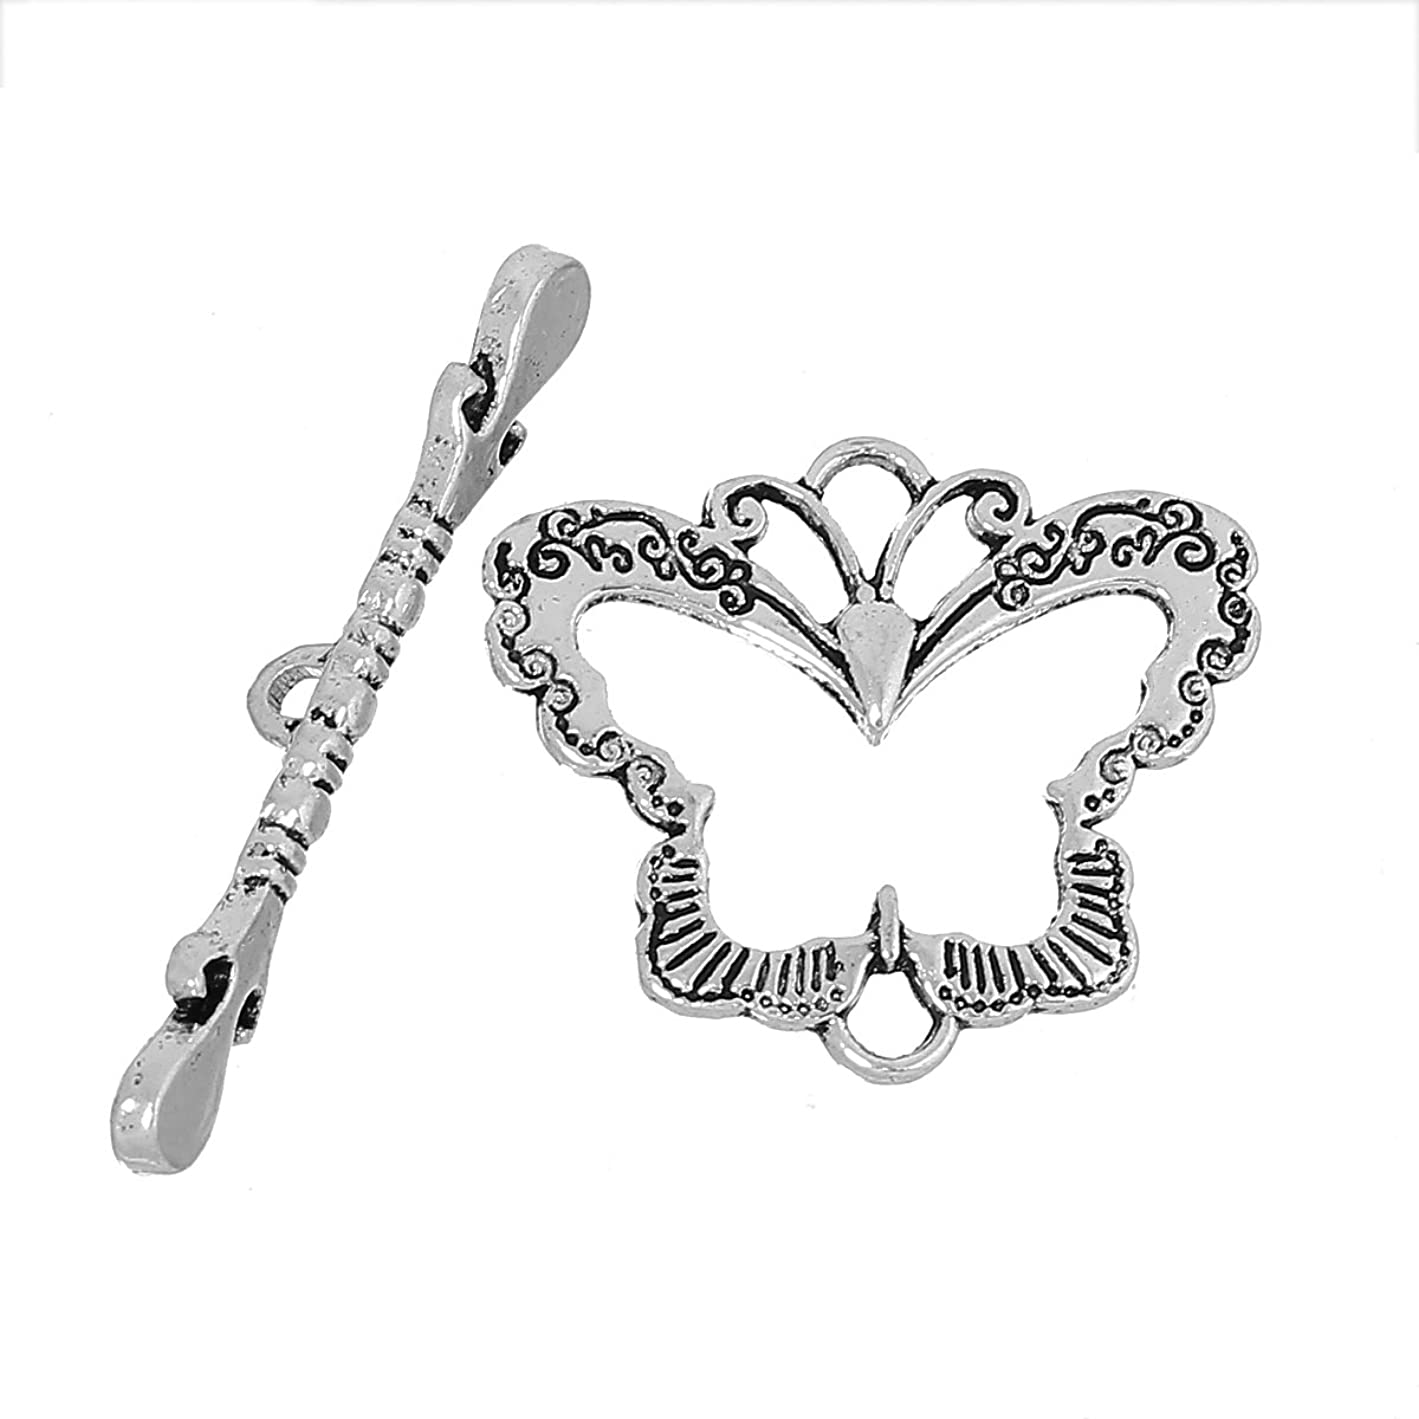 28 Sets Silver Tone Bracelet Toggle Clasps, DIY Jewelry Making (Butterfly) k14150882728202